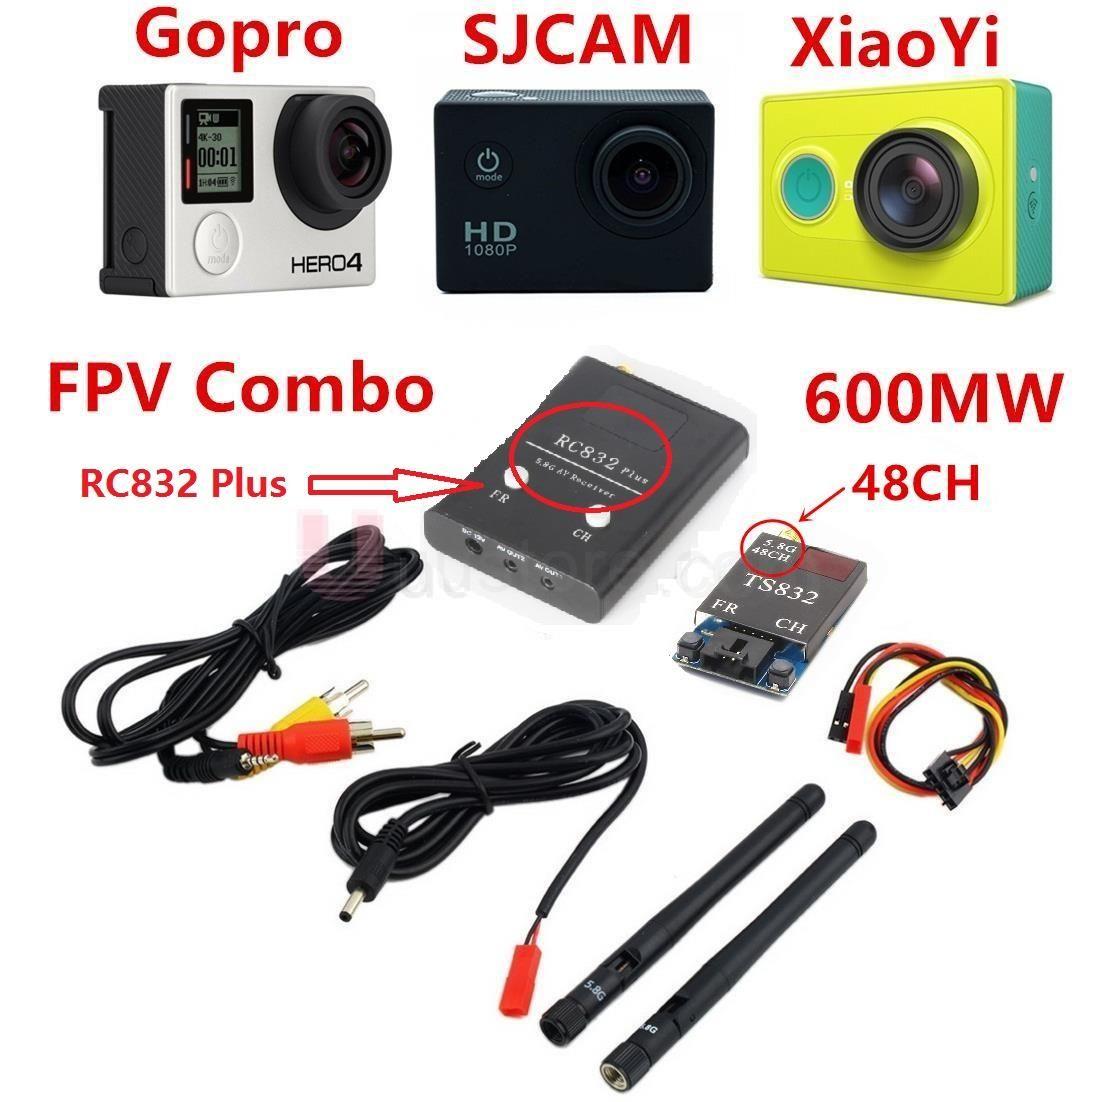 FPV System Boscam 5.8Ghz 600mW 48CH Transmitter TS832 &Receiver RC832 Plus FPV System For QAV210 QAV250 Drone Quadcopter Walkera